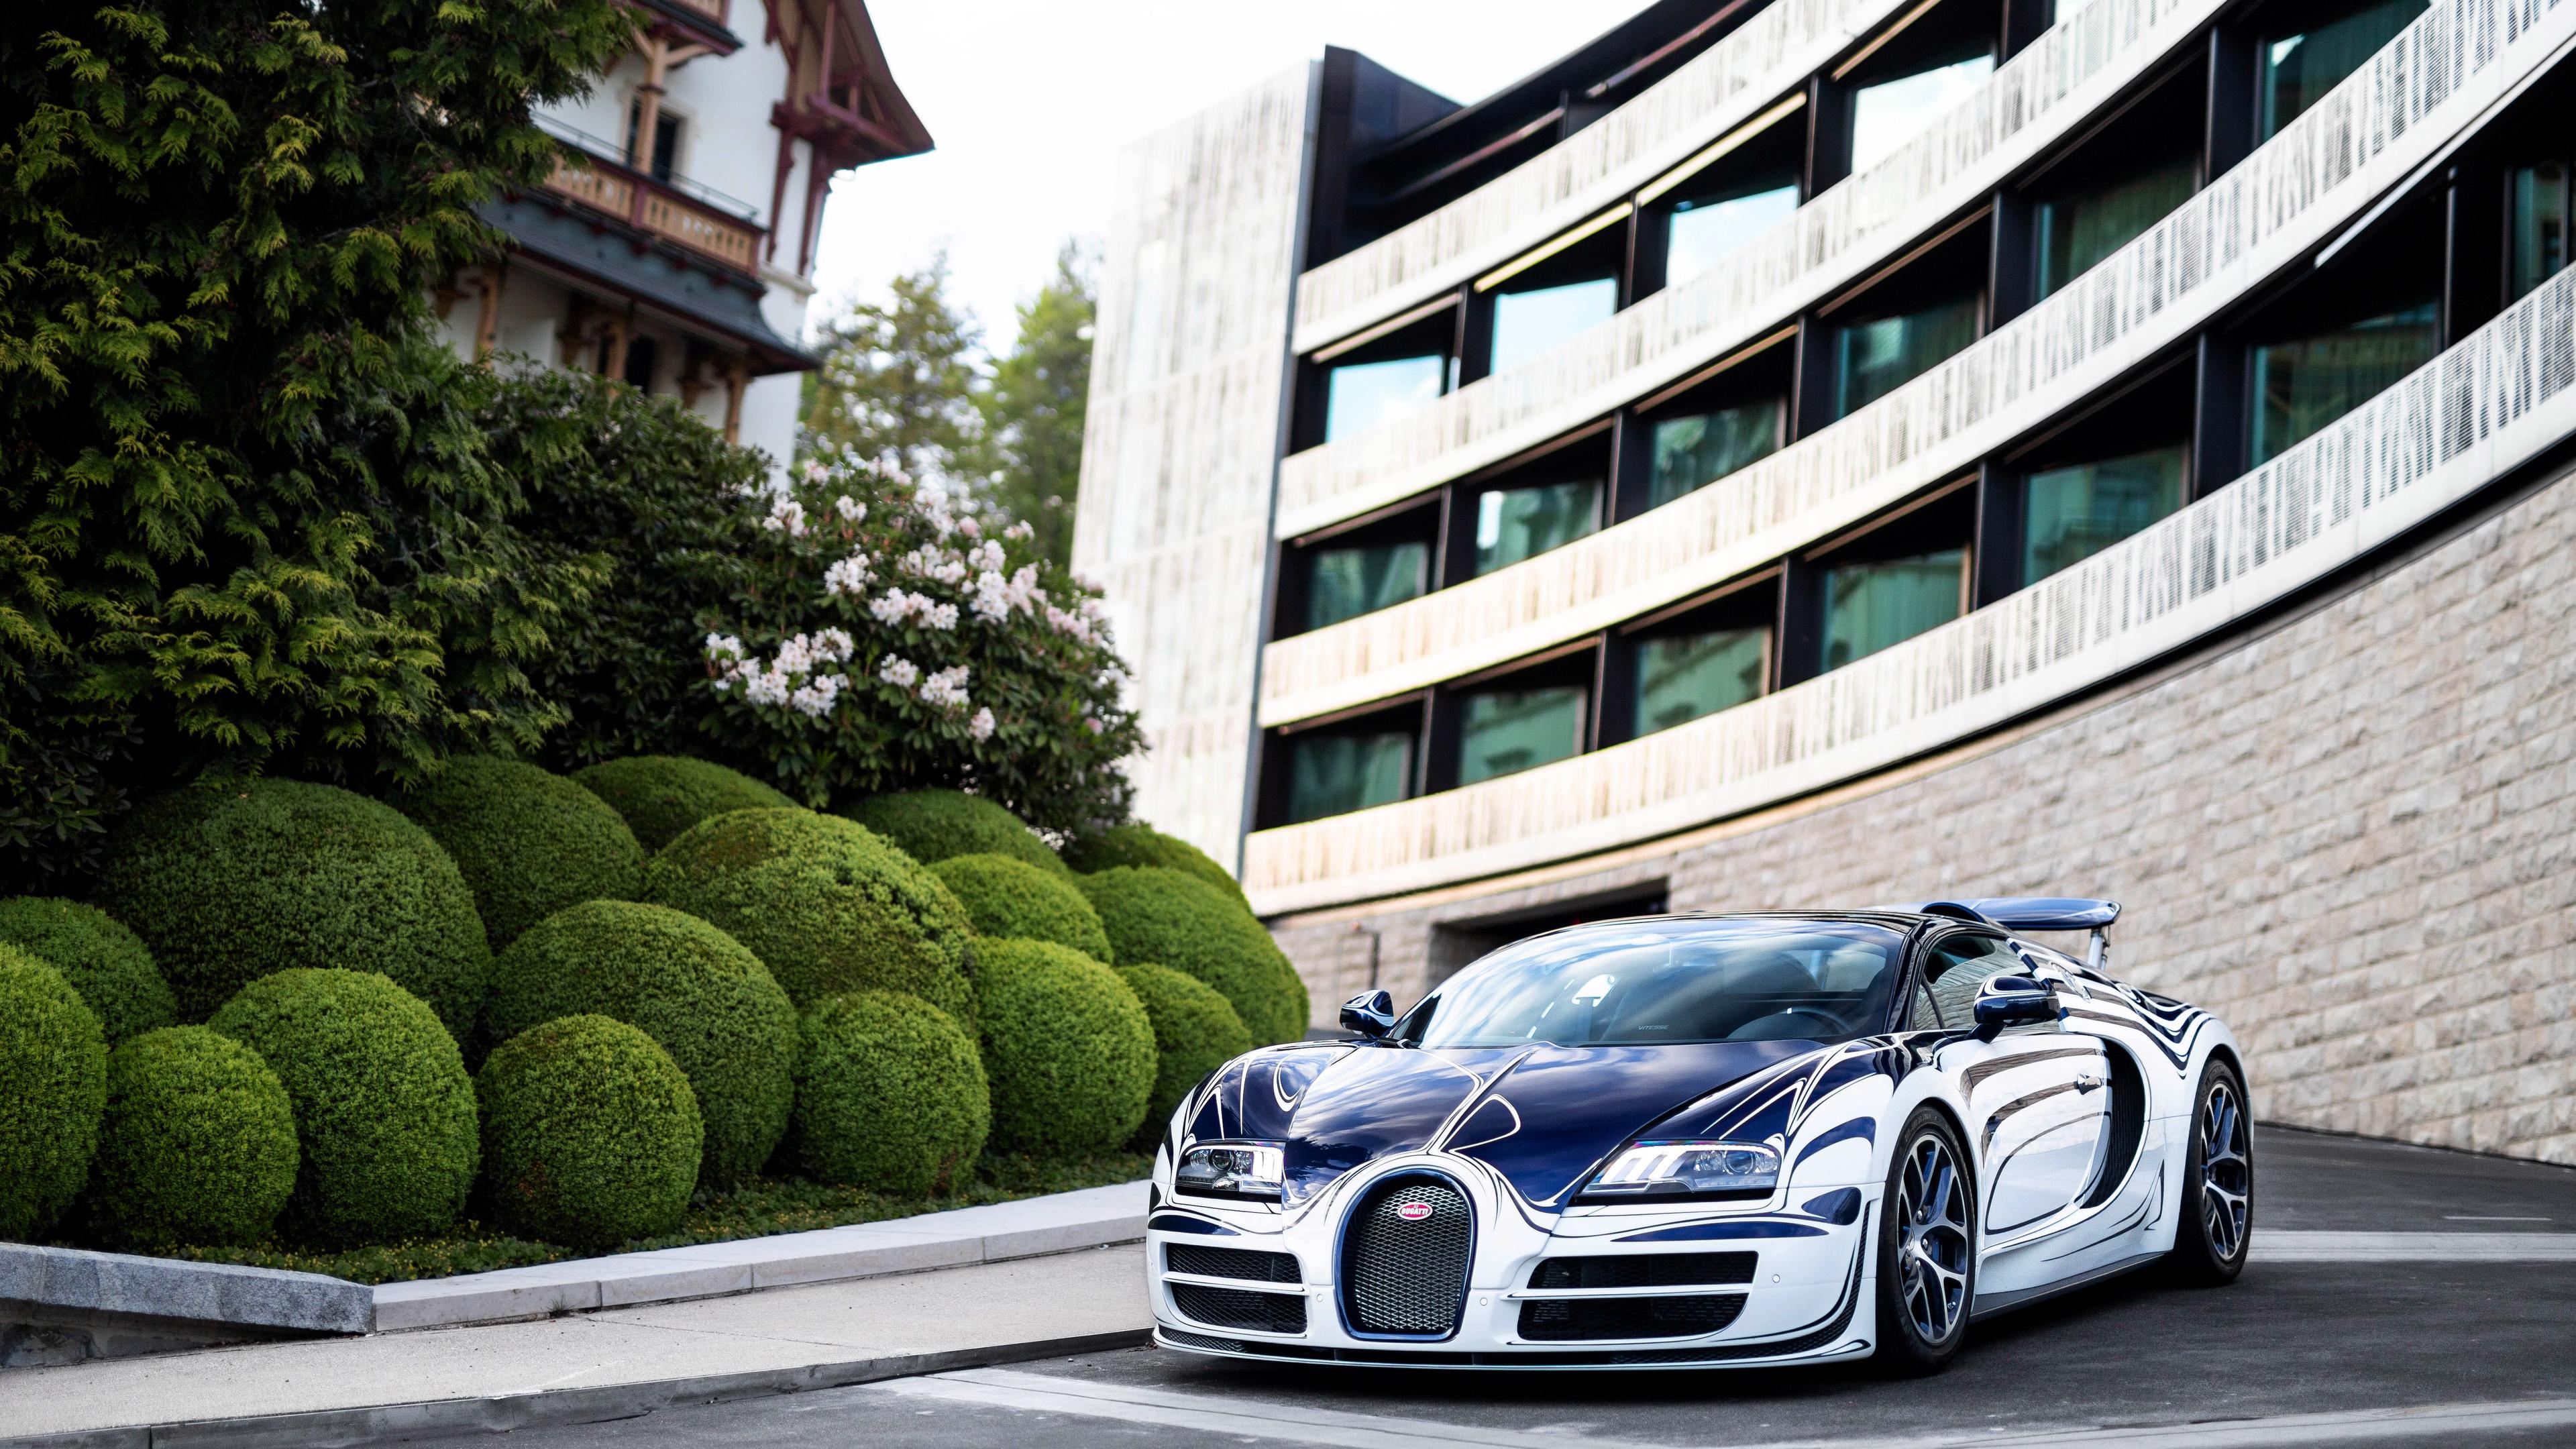 bugatti veyron grand sport roadster 4k 1560534258 - Bugatti Veyron Grand Sport Roadster 4k - hd-wallpapers, cars wallpapers, bugatti wallpapers, bugatti veyron wallpapers, 4k-wallpapers